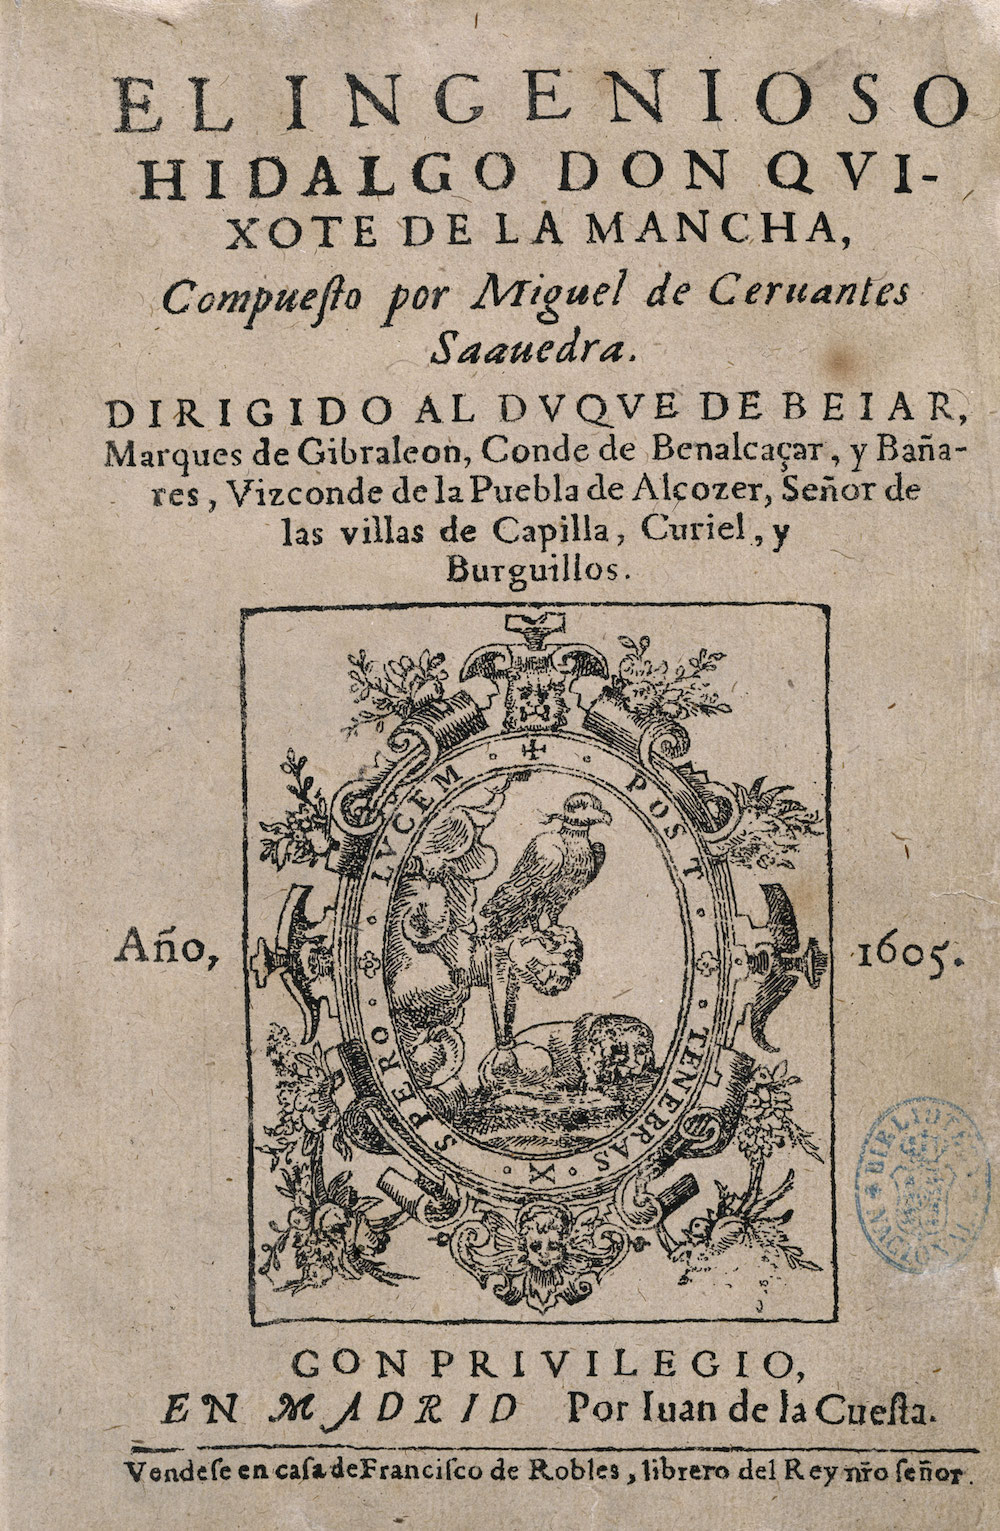 Coleccionismo Cervantino, Portada, Biblioteca Nacional de España, Madrid, 2015.